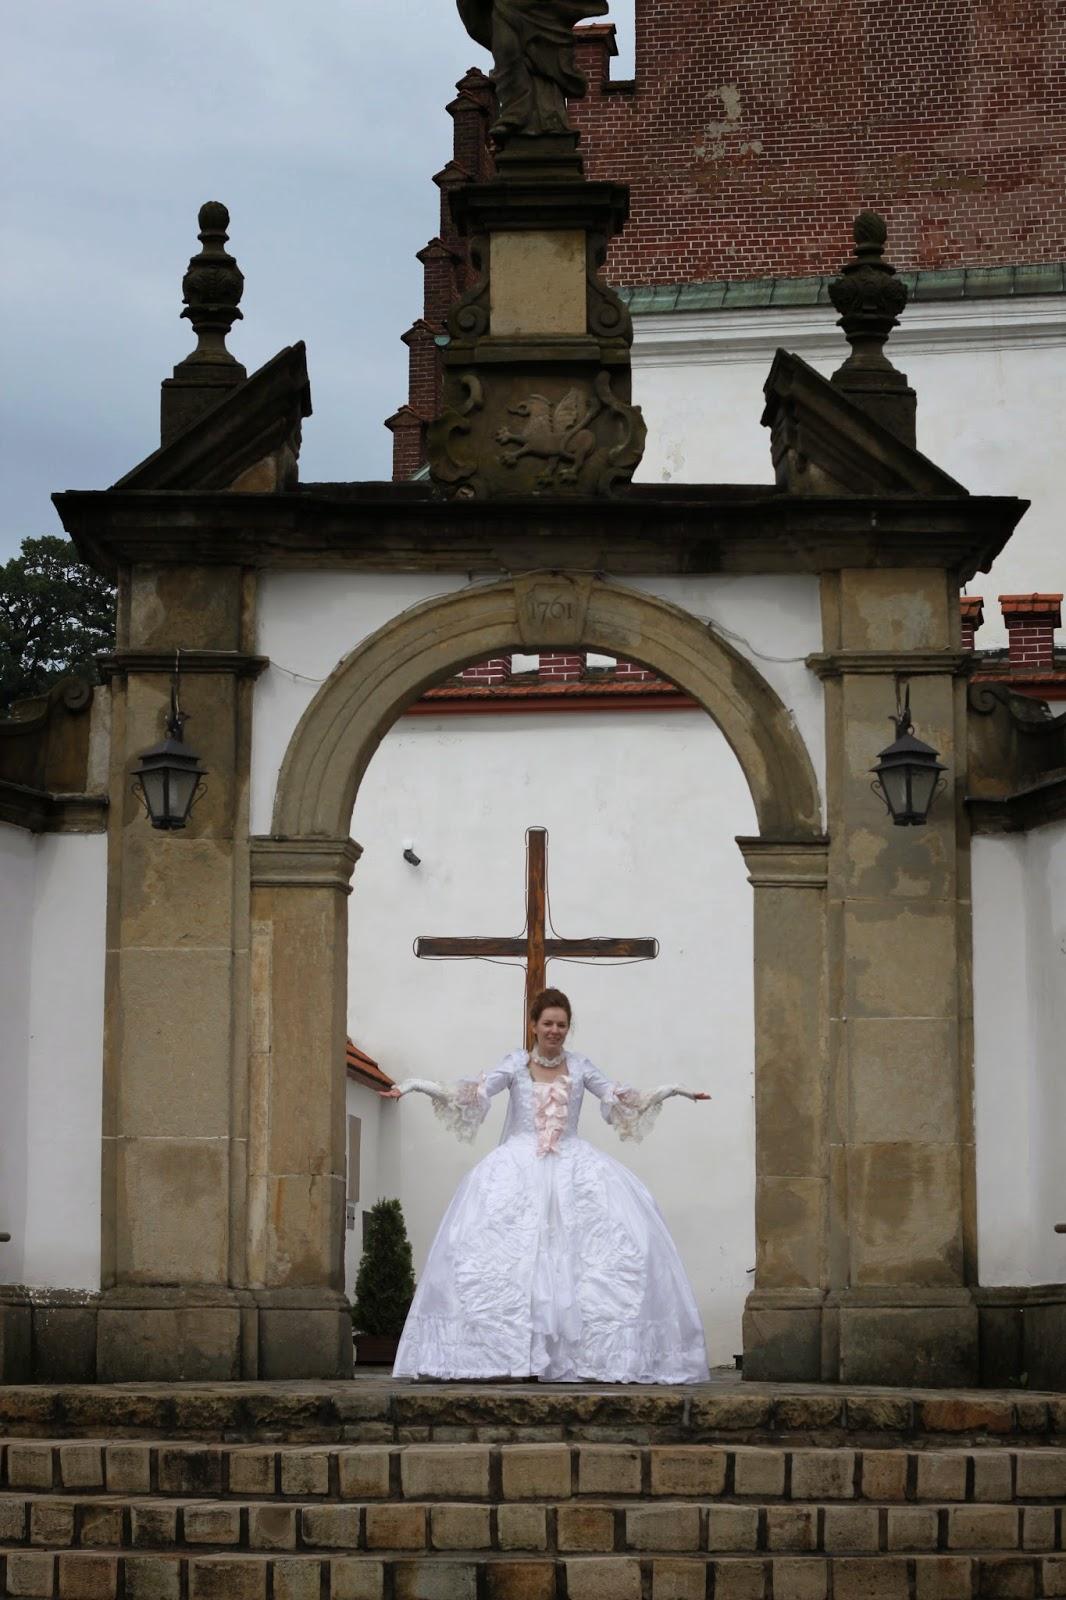 http://kostiumiglanitka.blogspot.com/2014/05/prawie-jak-maria-antonina-czyli-wersal.html